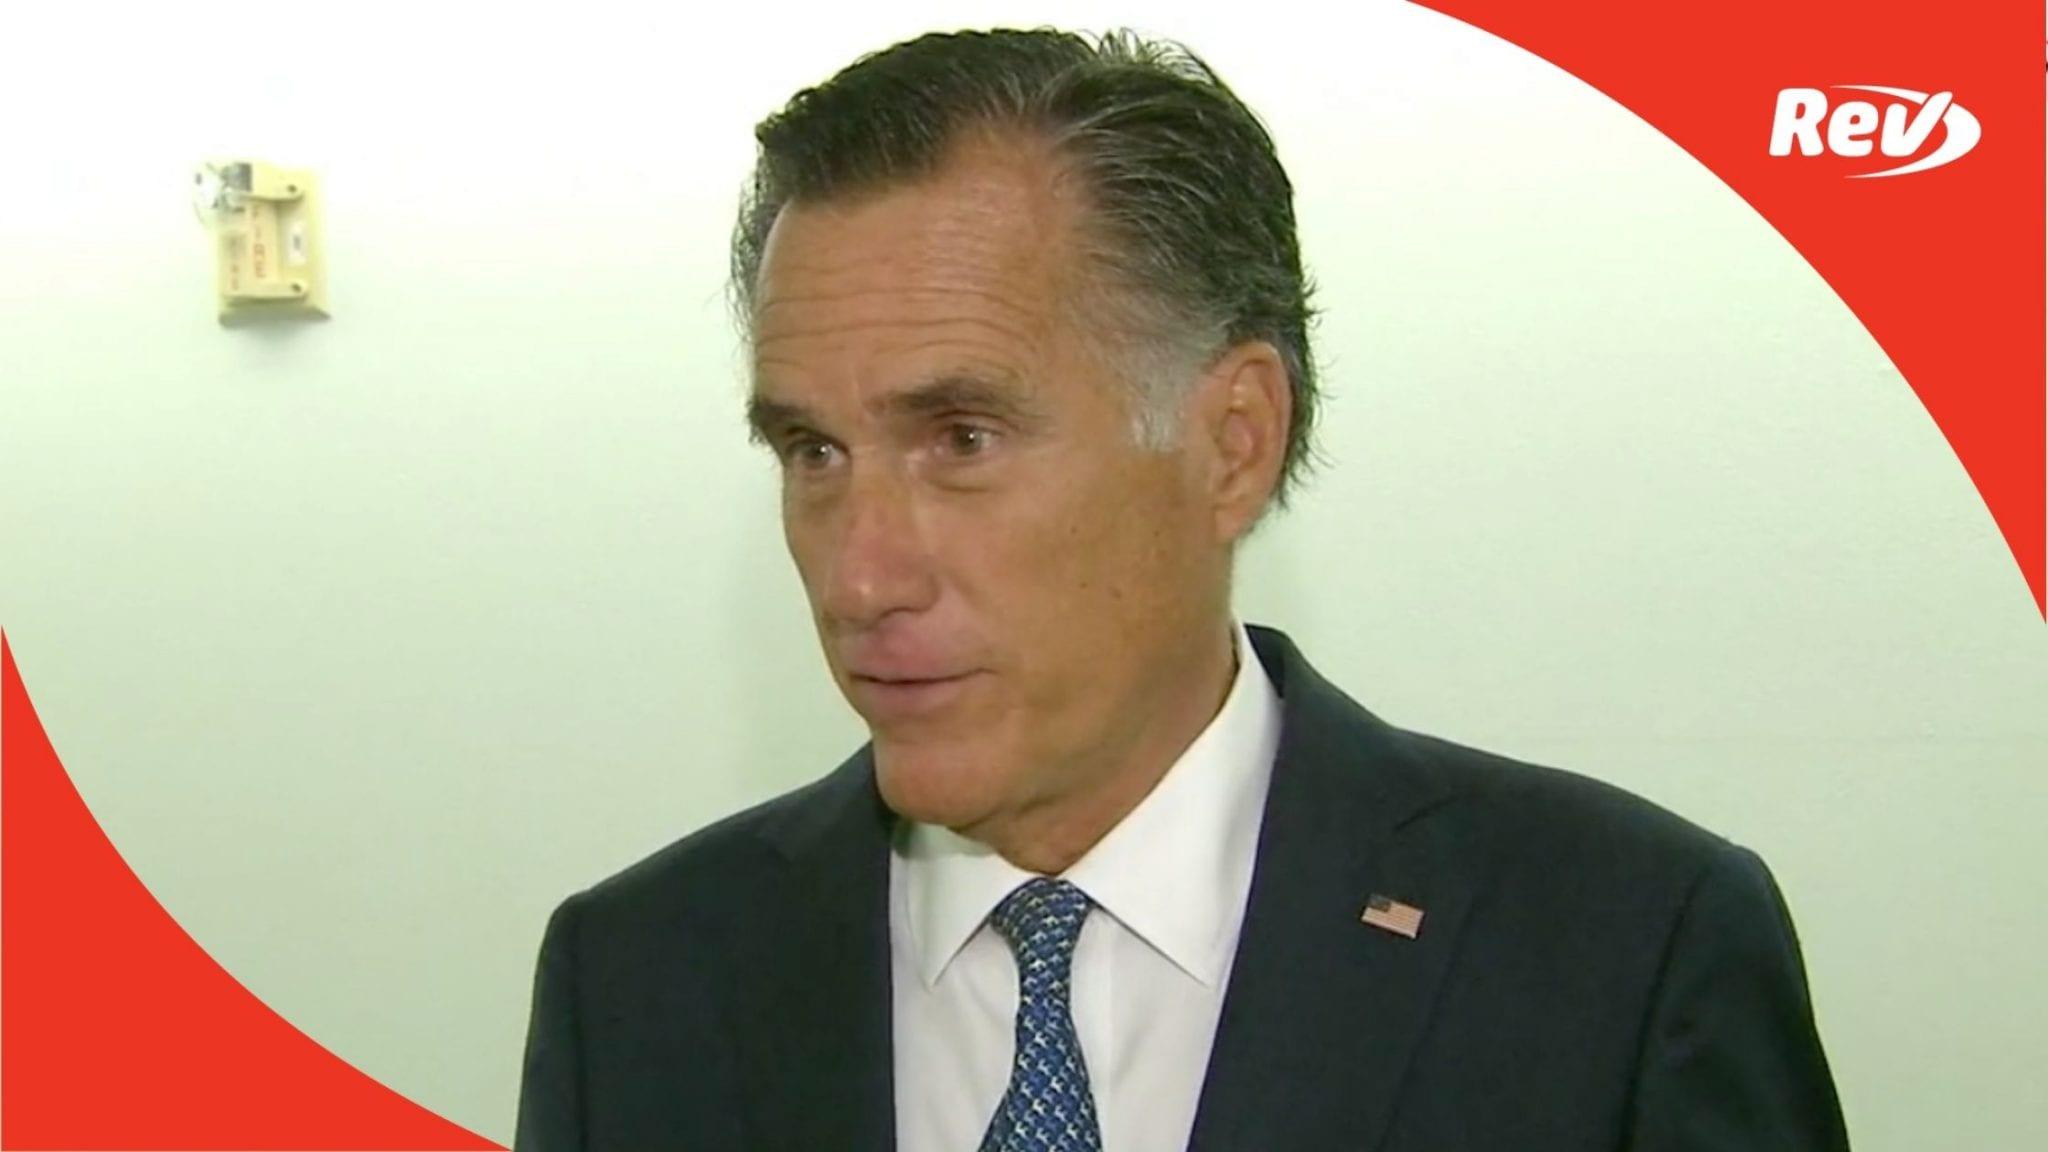 Mitt Romney Will Support Vote on SCOTUS Nominee Remarks Transcript September 22